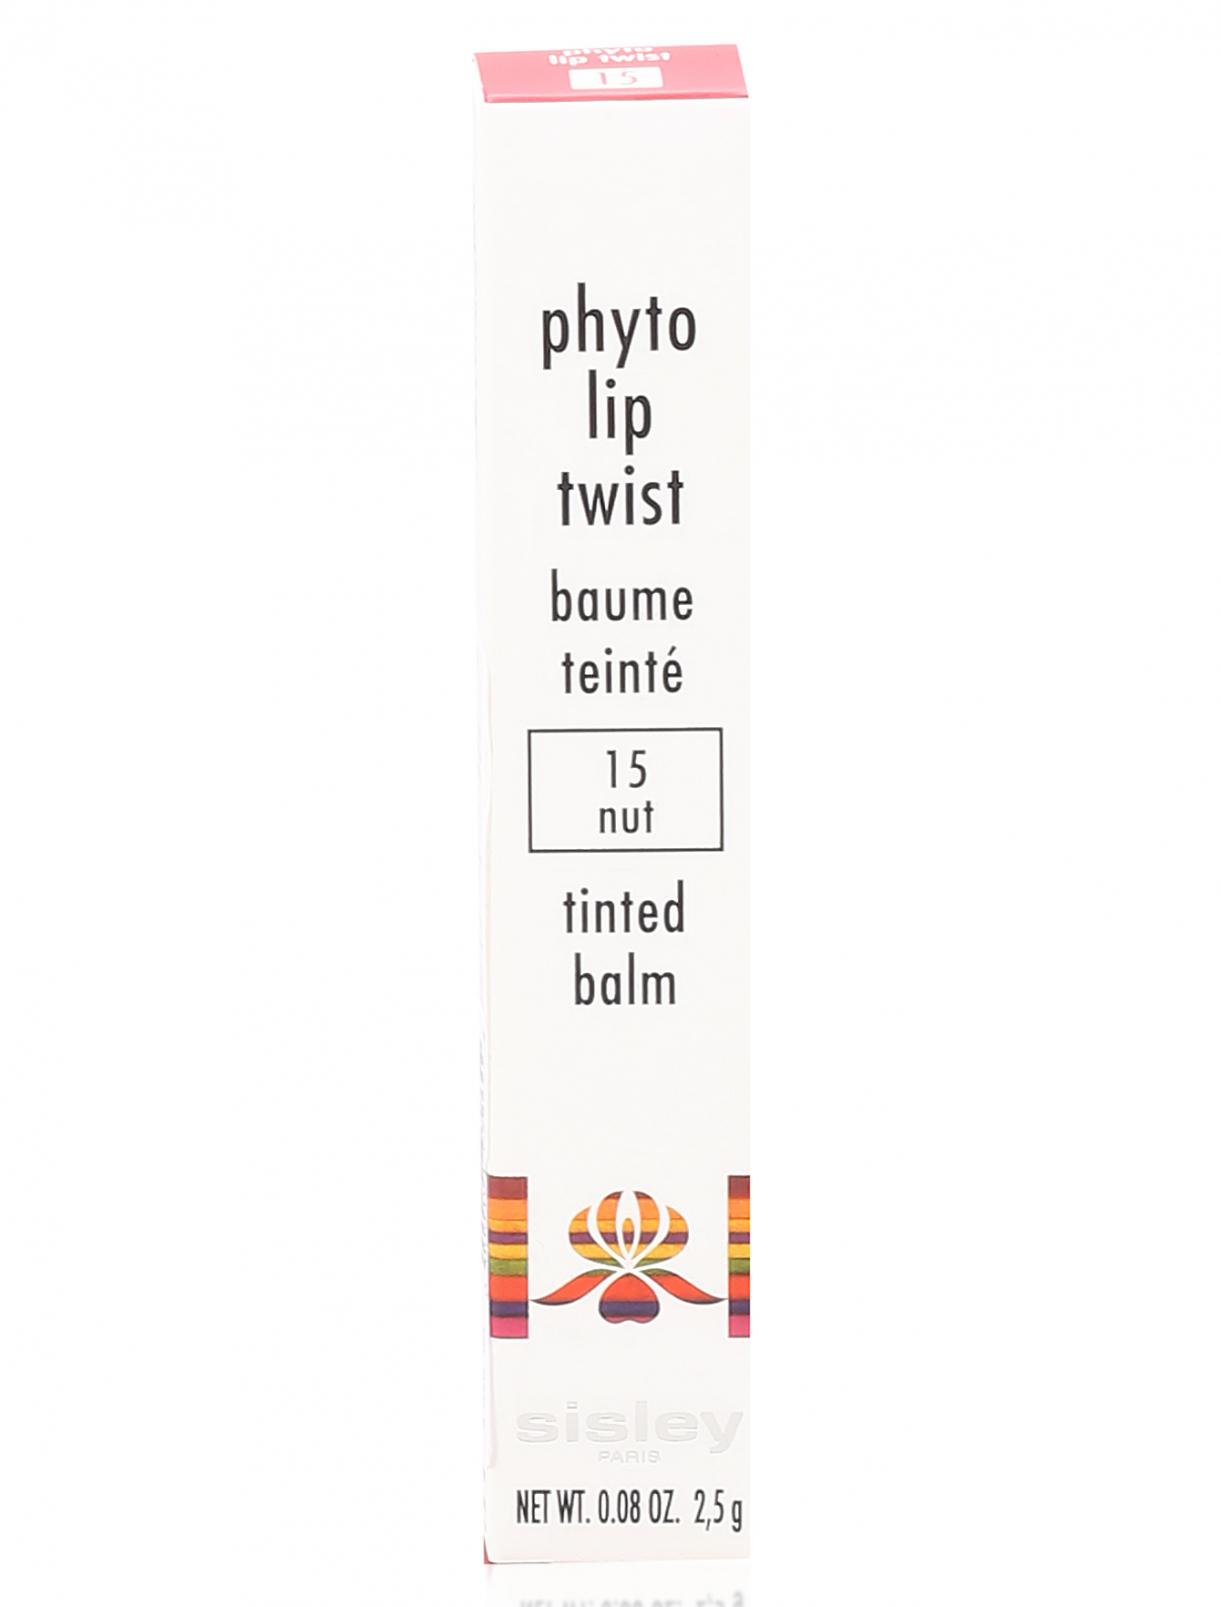 Блеск-карандаш для губ - №15 Nut Phyto-Lip Twist Sisley  –  Модель Общий вид